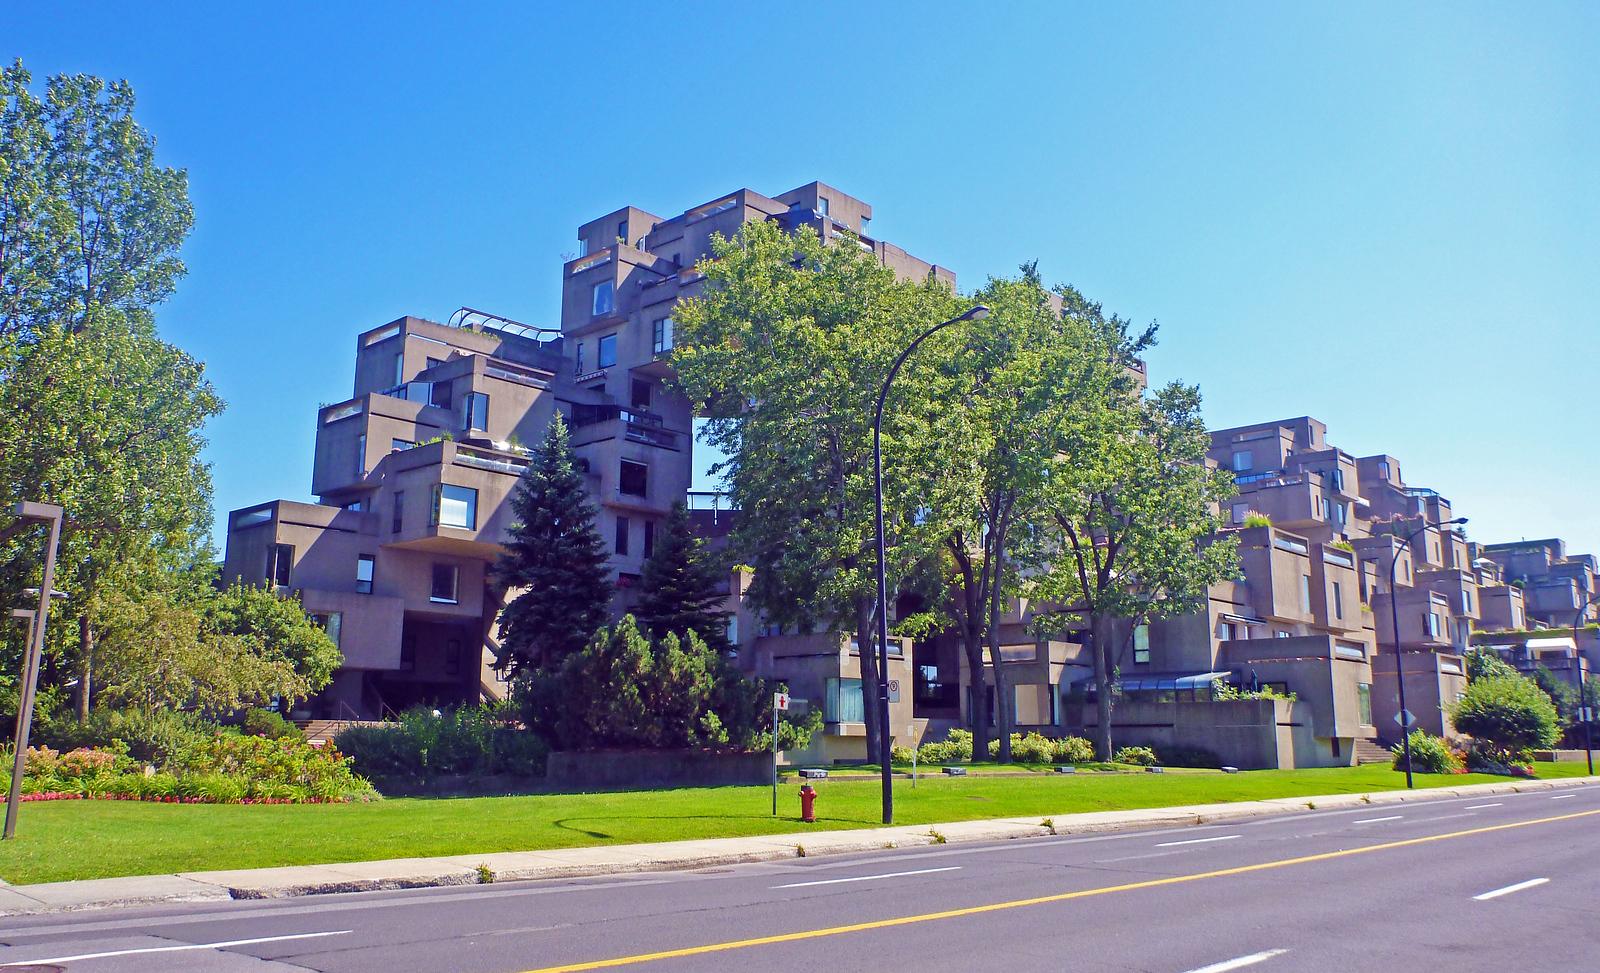 Habitat 67 Montreal - Cube Housing Complex